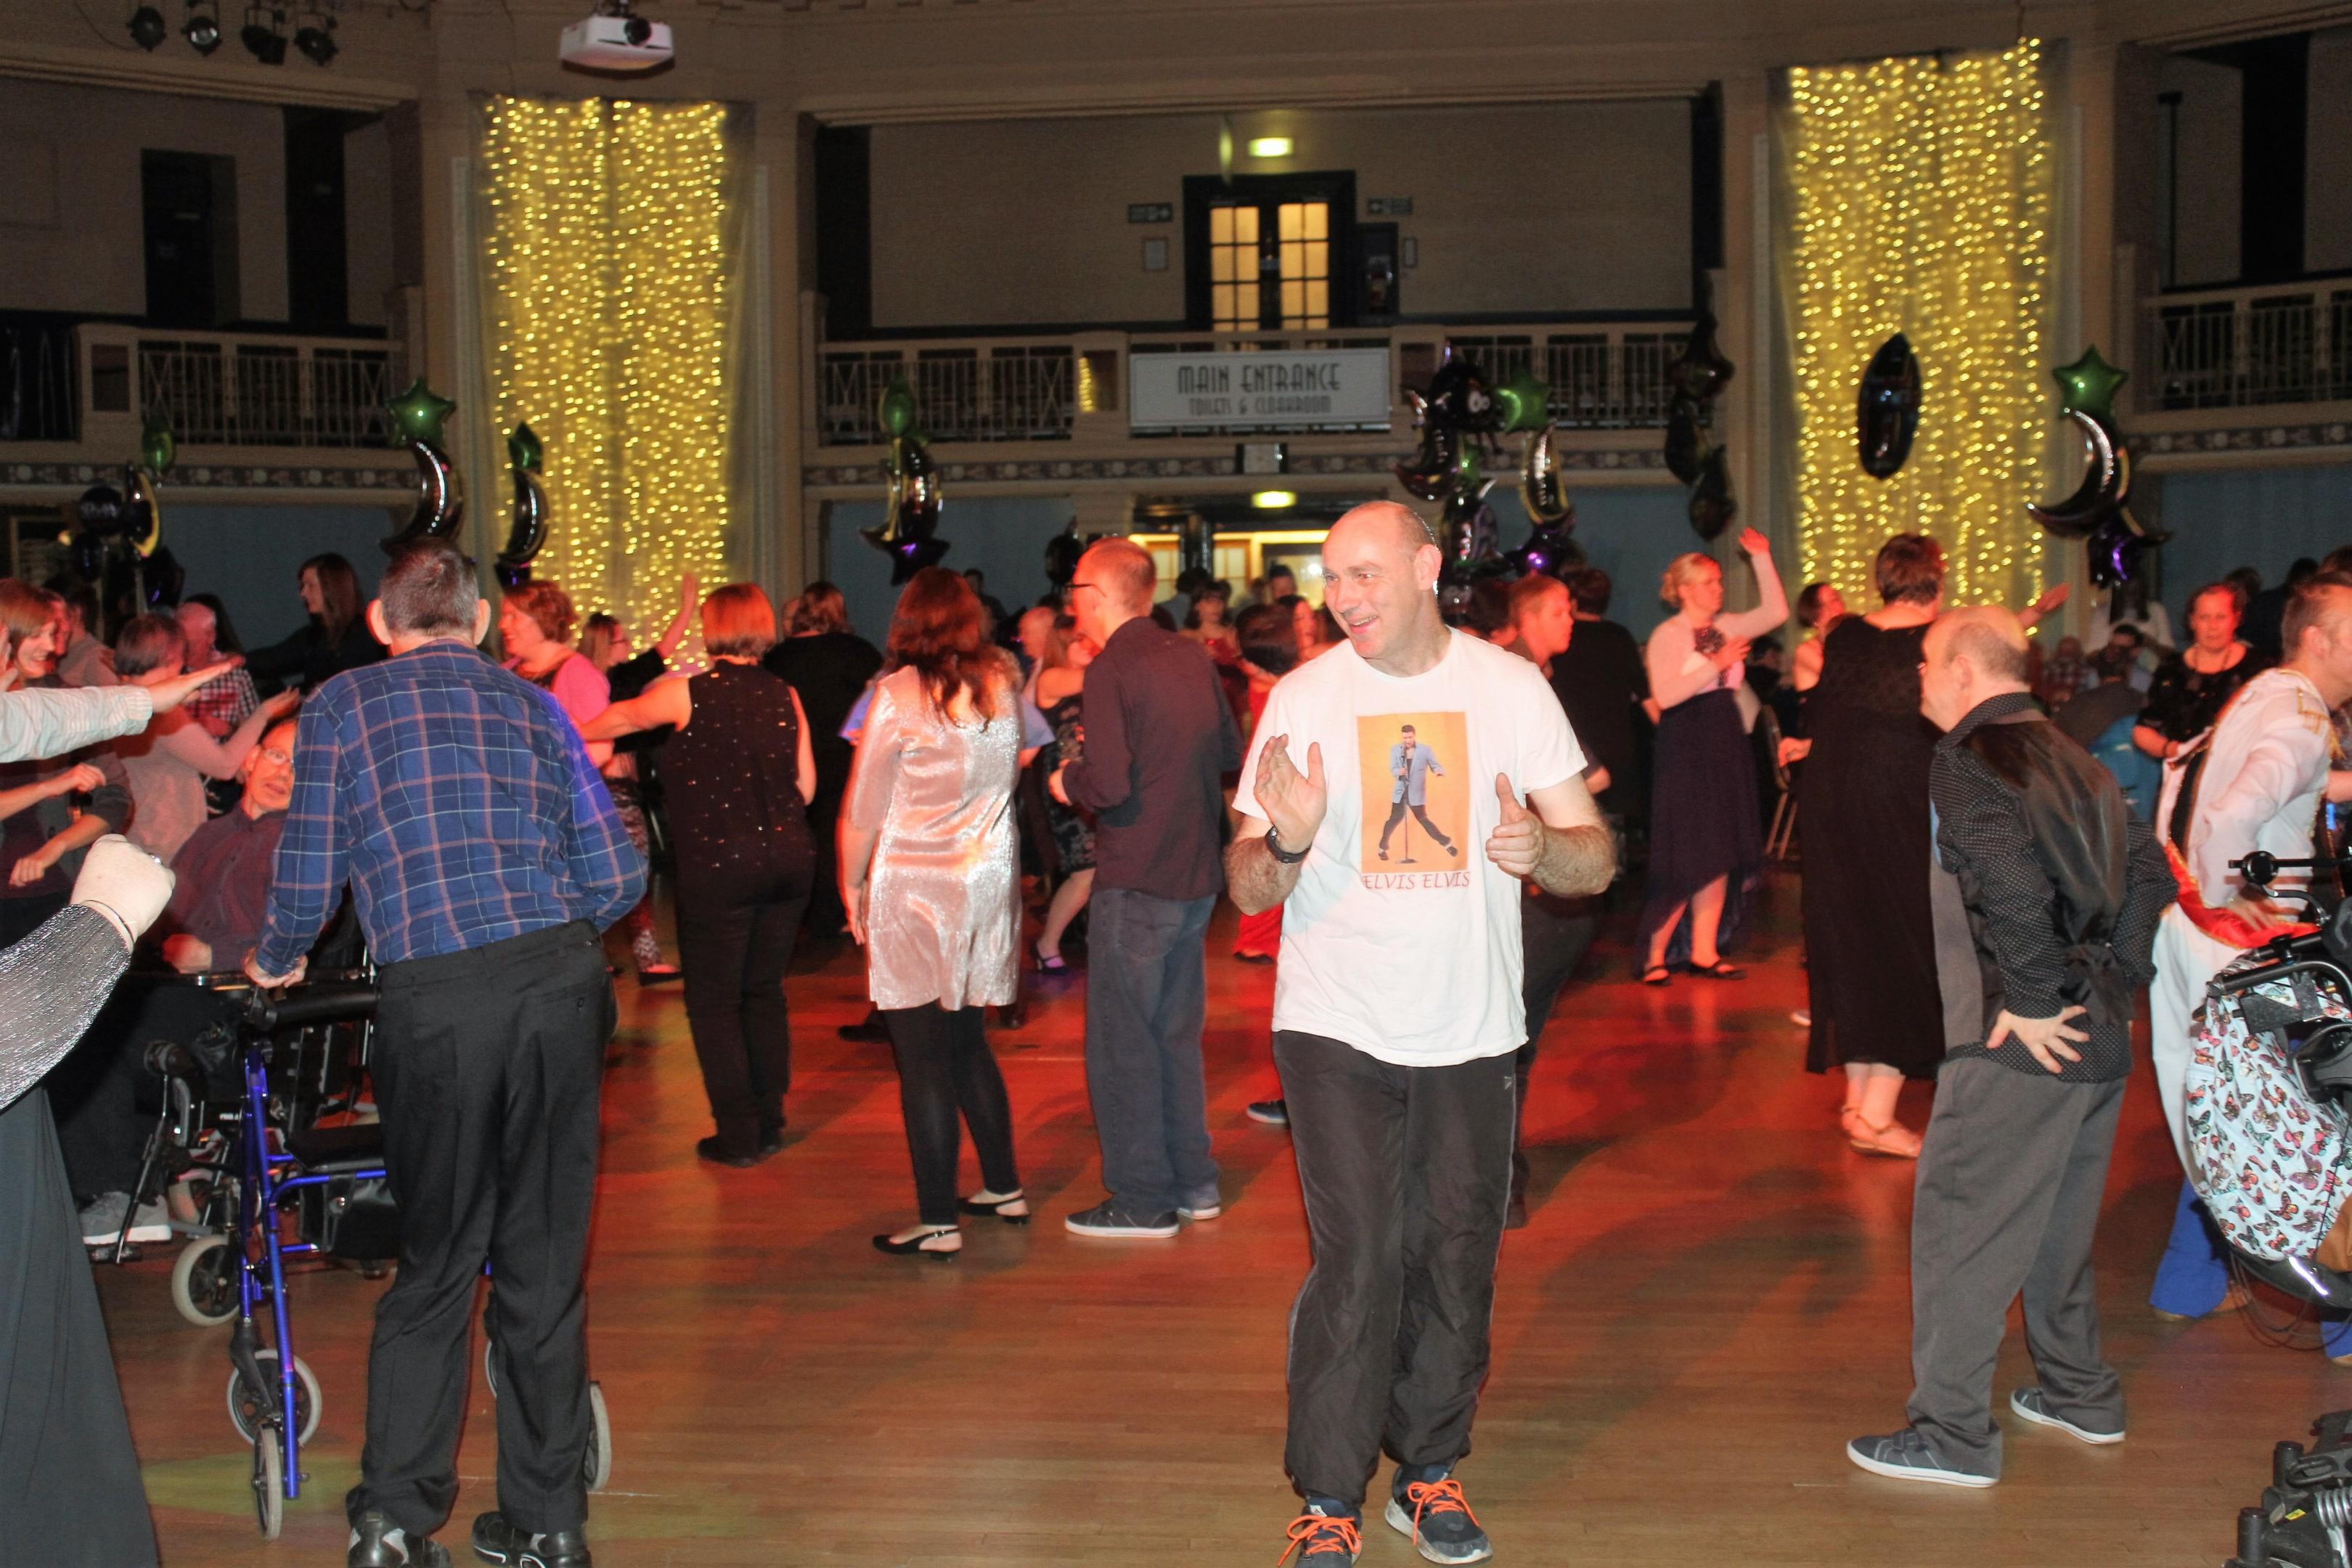 Revellers enjoying last year's Sparkles Ball, in the Beach Ballroom.